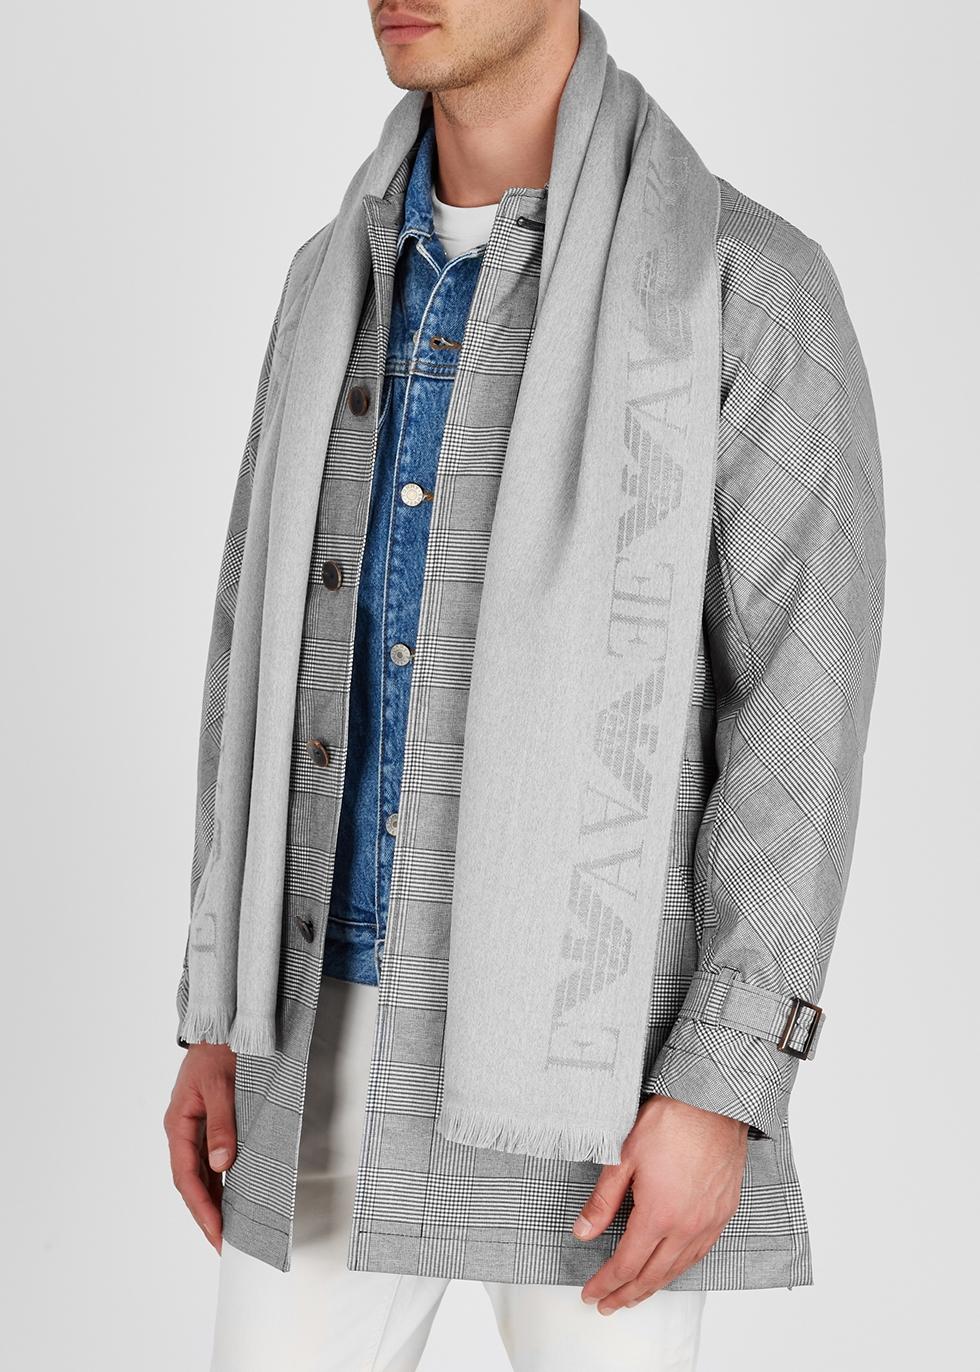 Silver wool scarf - Emporio Armani